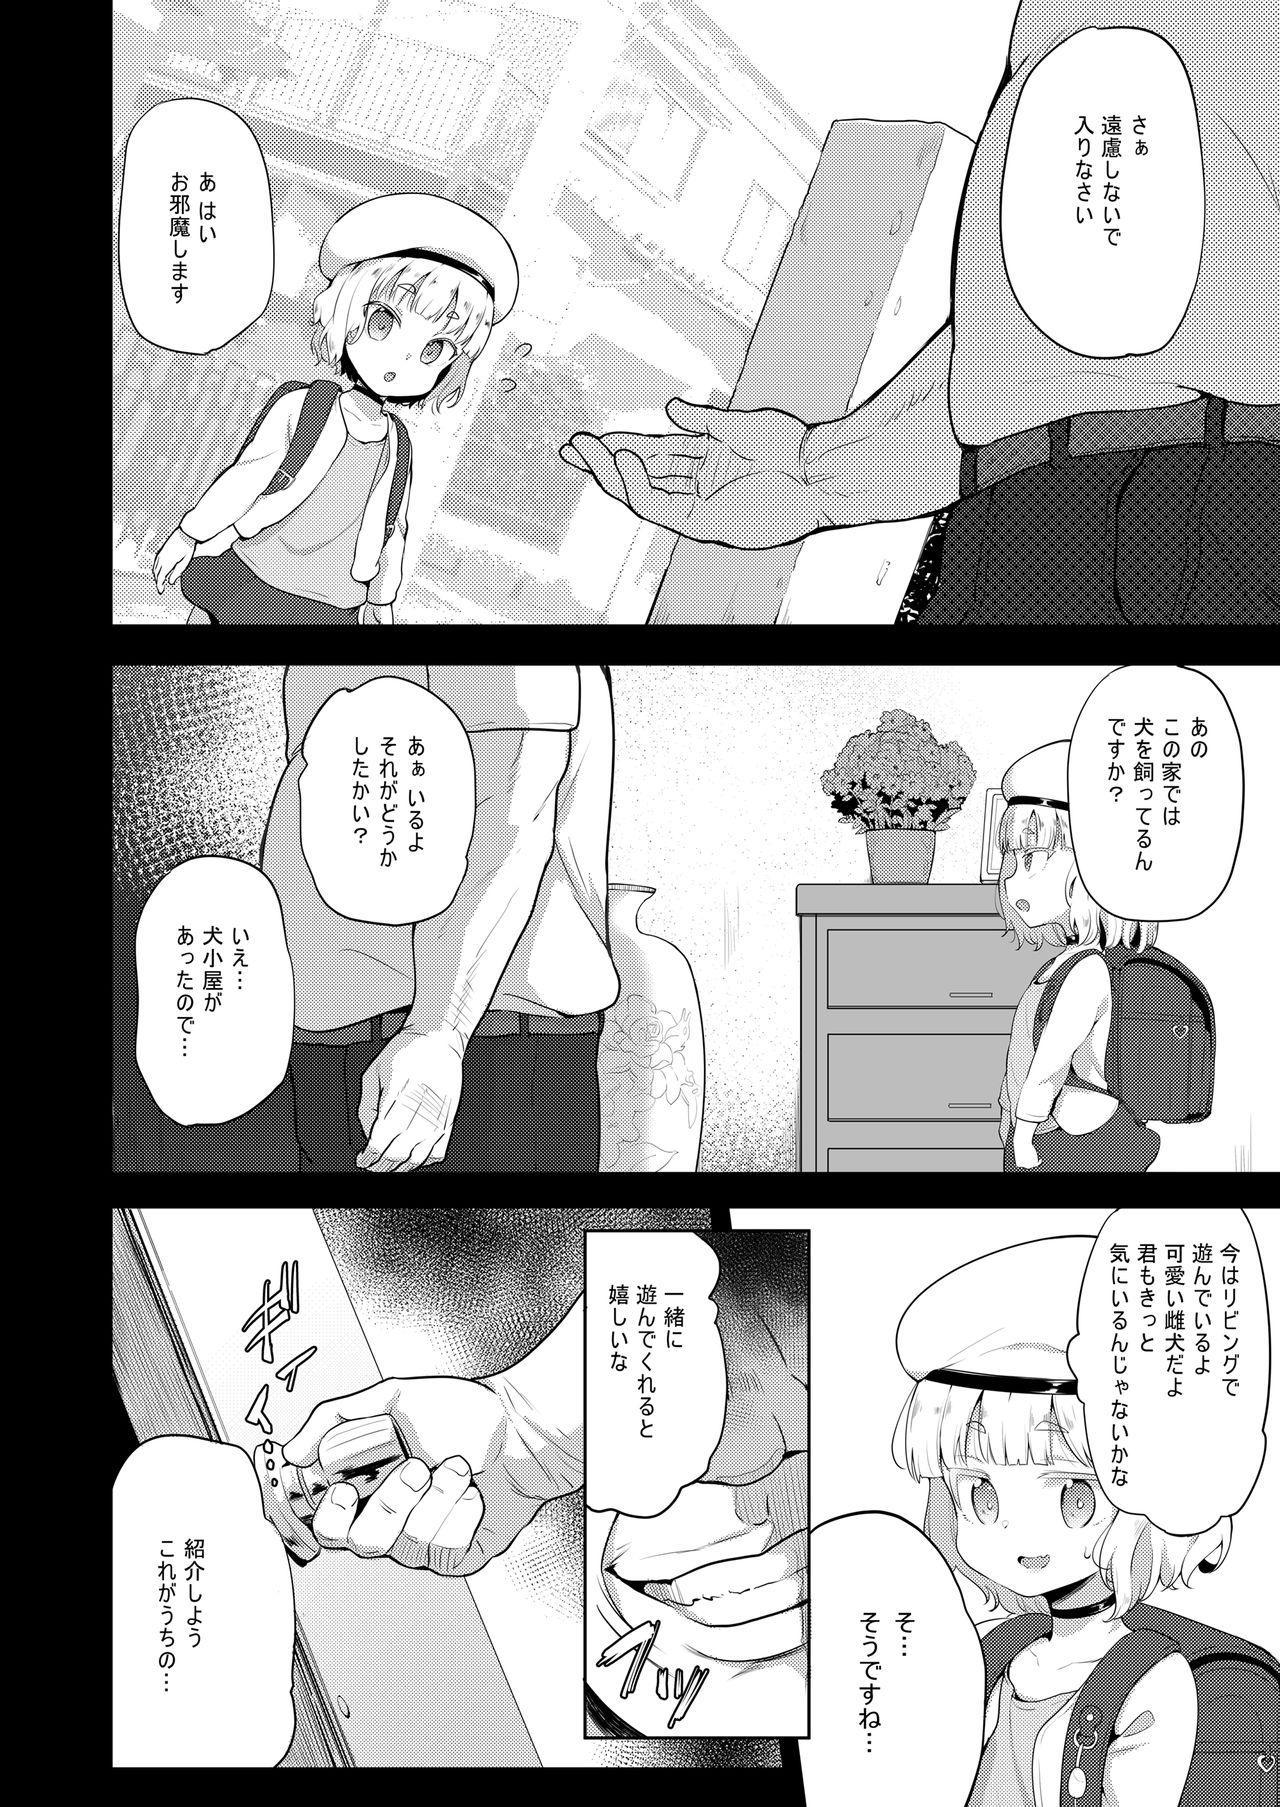 Seiyouken Choukyou 2 7